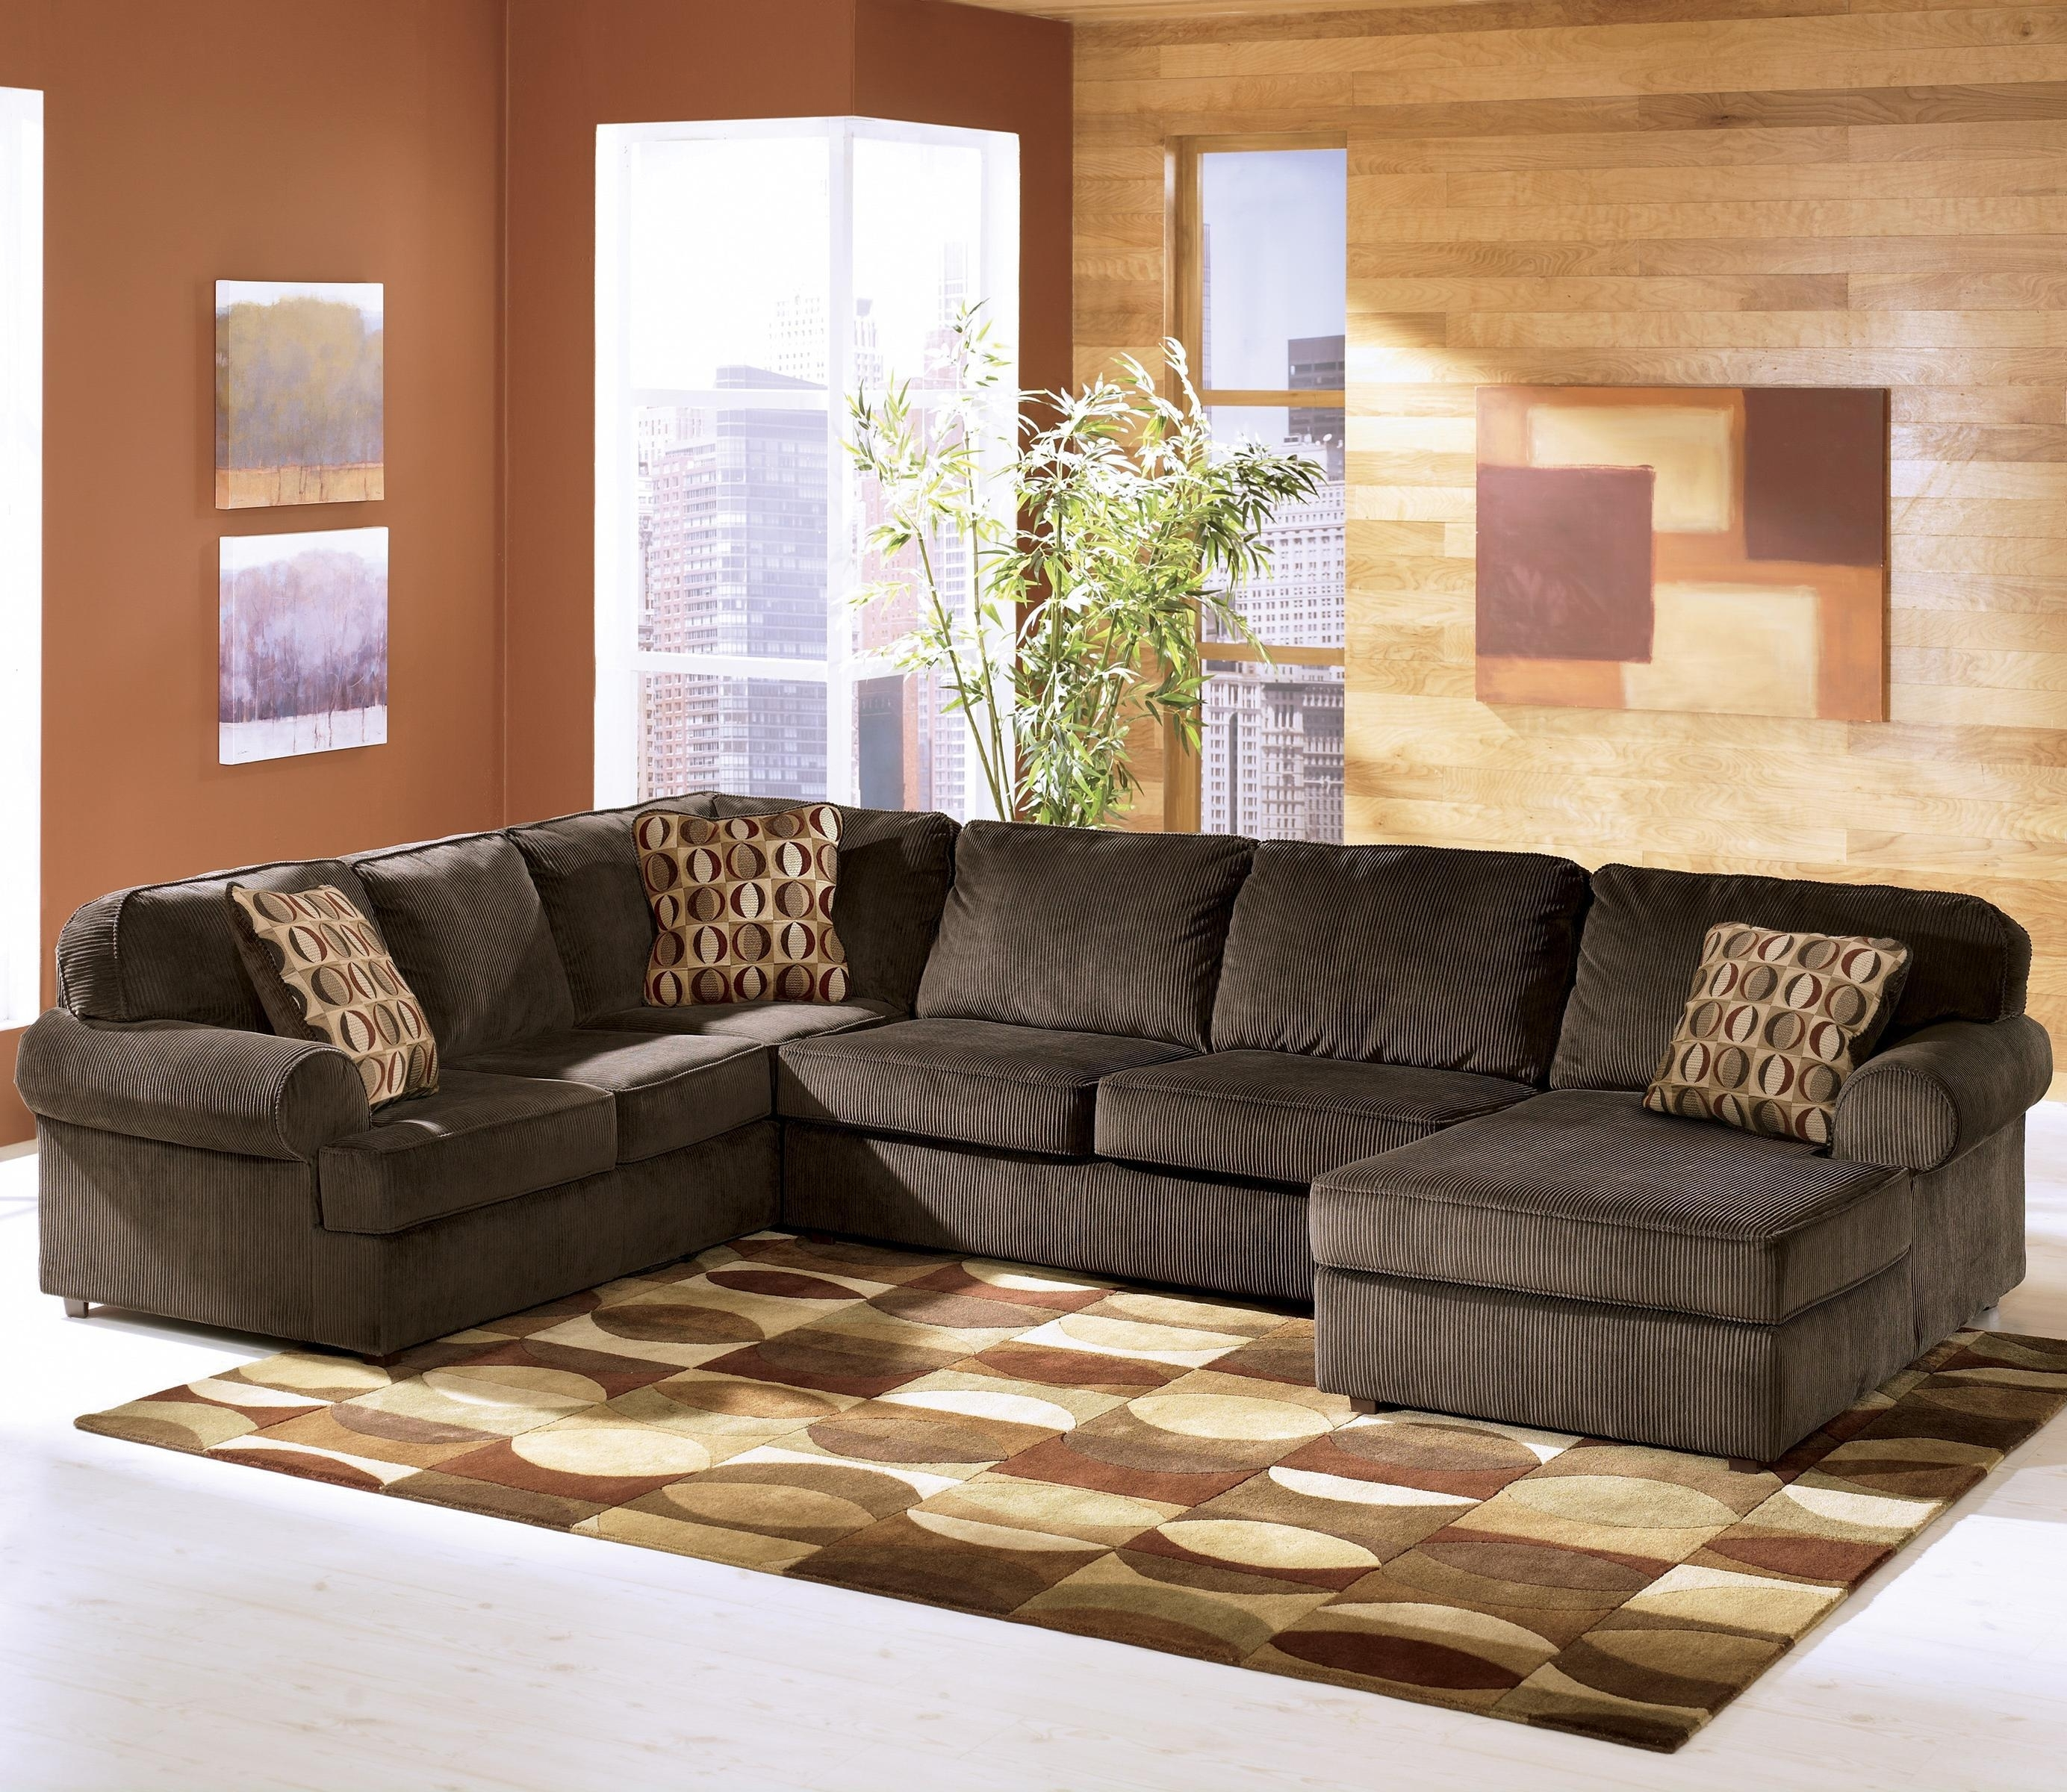 Killeen Tx Sectional Sofas Inside Newest Furniture & Sofa: Ashleys Furniture Killeen (View 7 of 15)